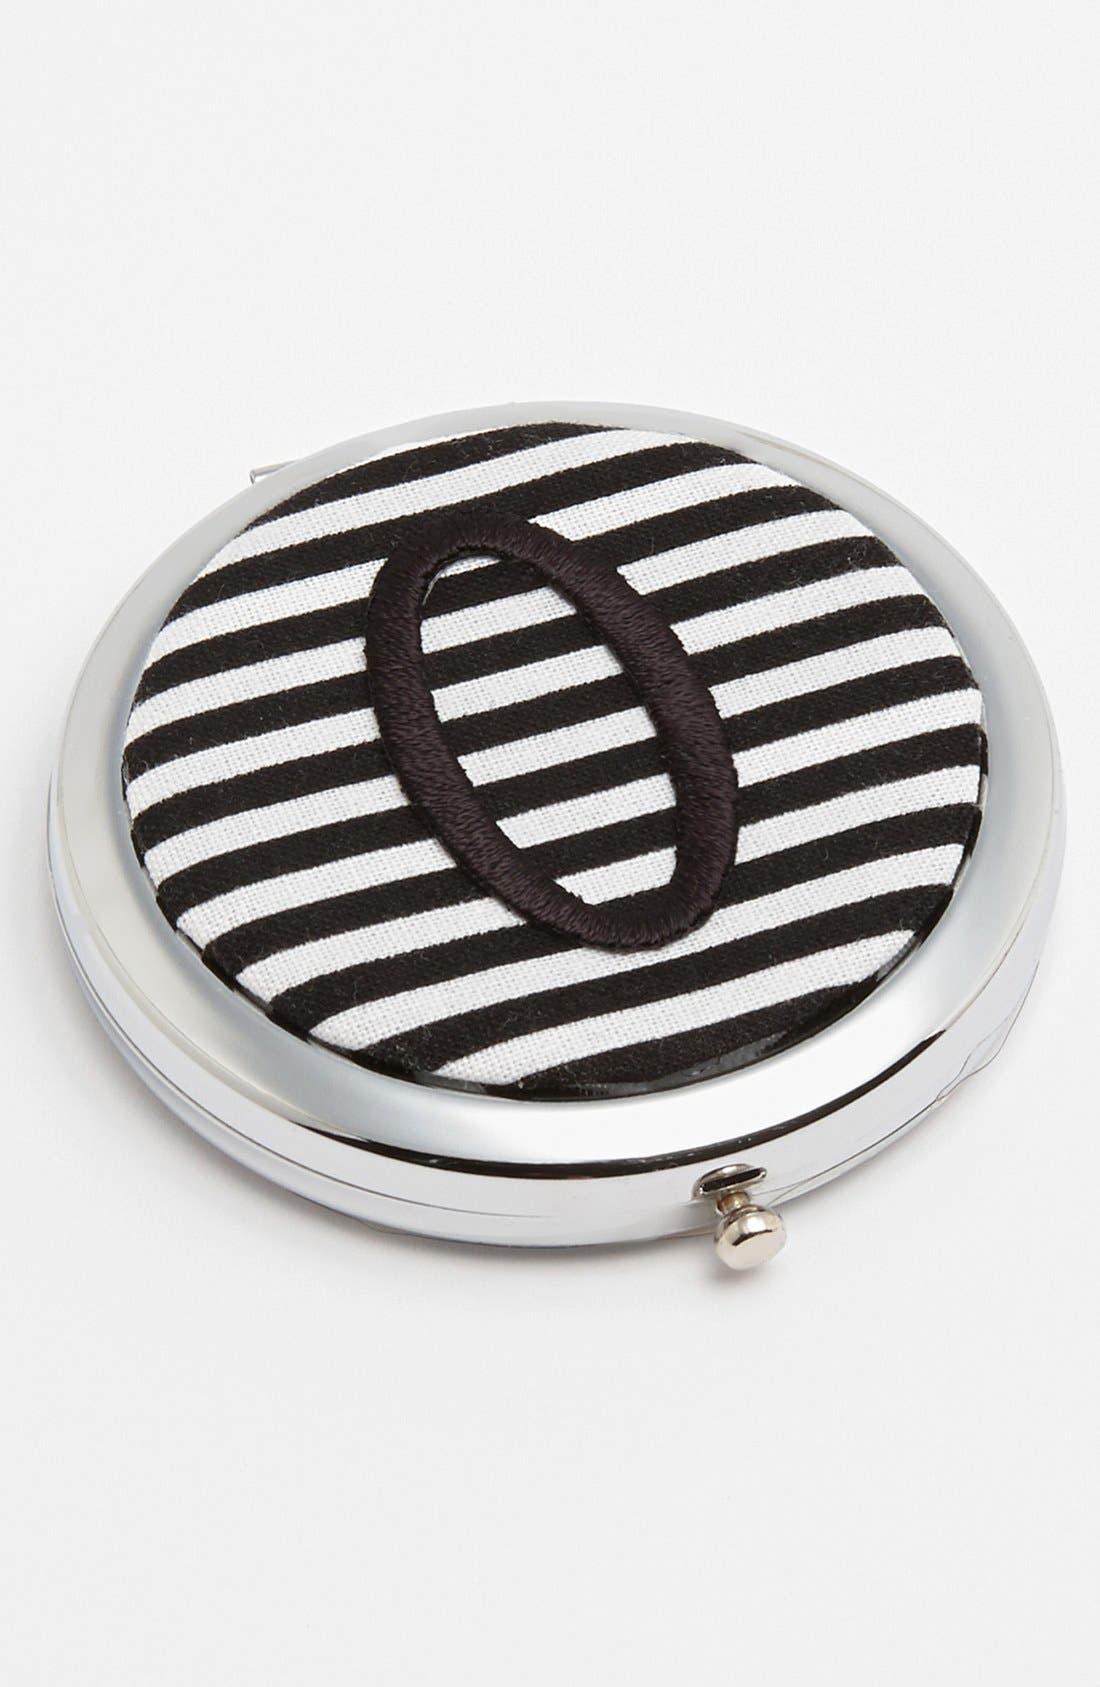 Main Image - Sweet Sorrella Designs 'O' Monogram Compact Mirror